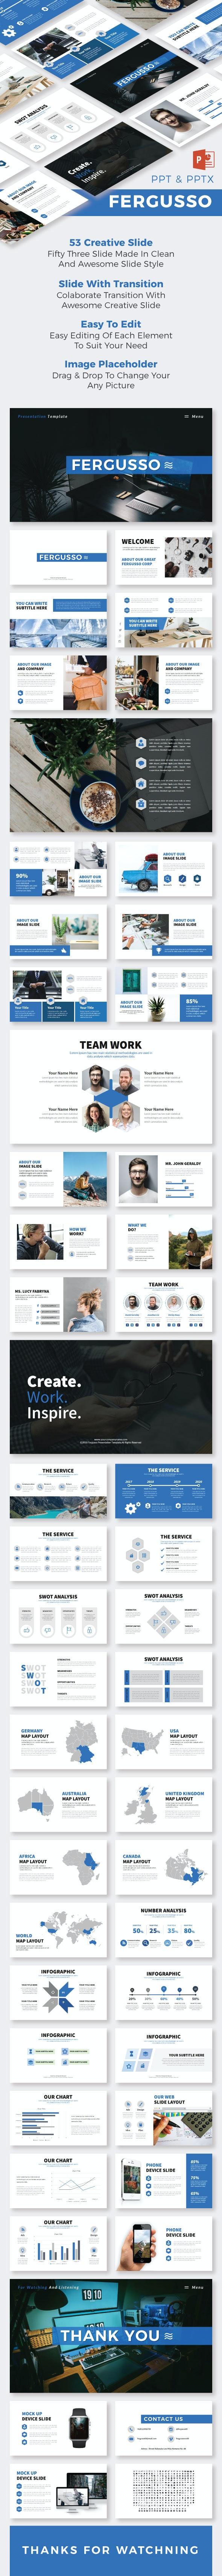 Fergusso PowerPoint Temp - Creative PowerPoint Templates